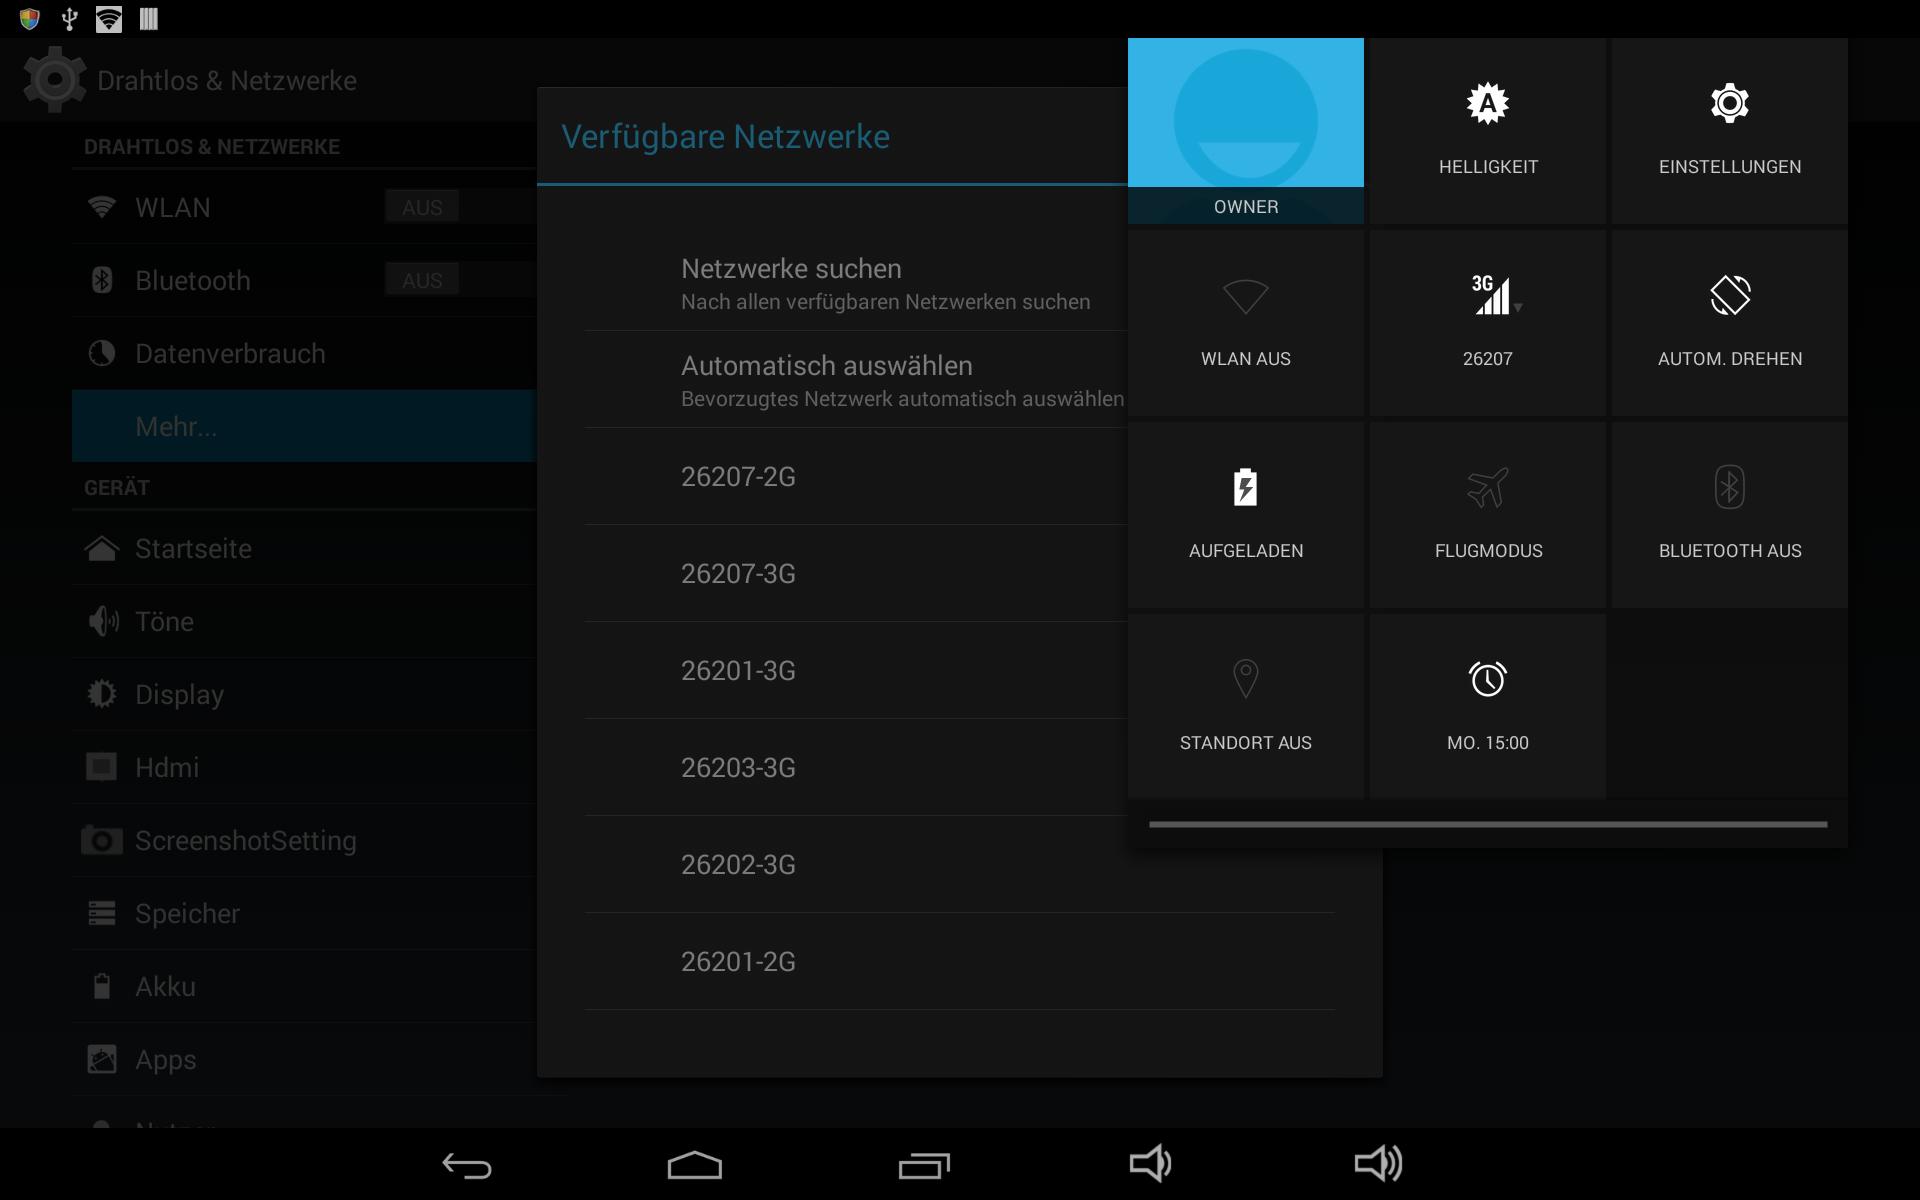 screenshot2-2.png